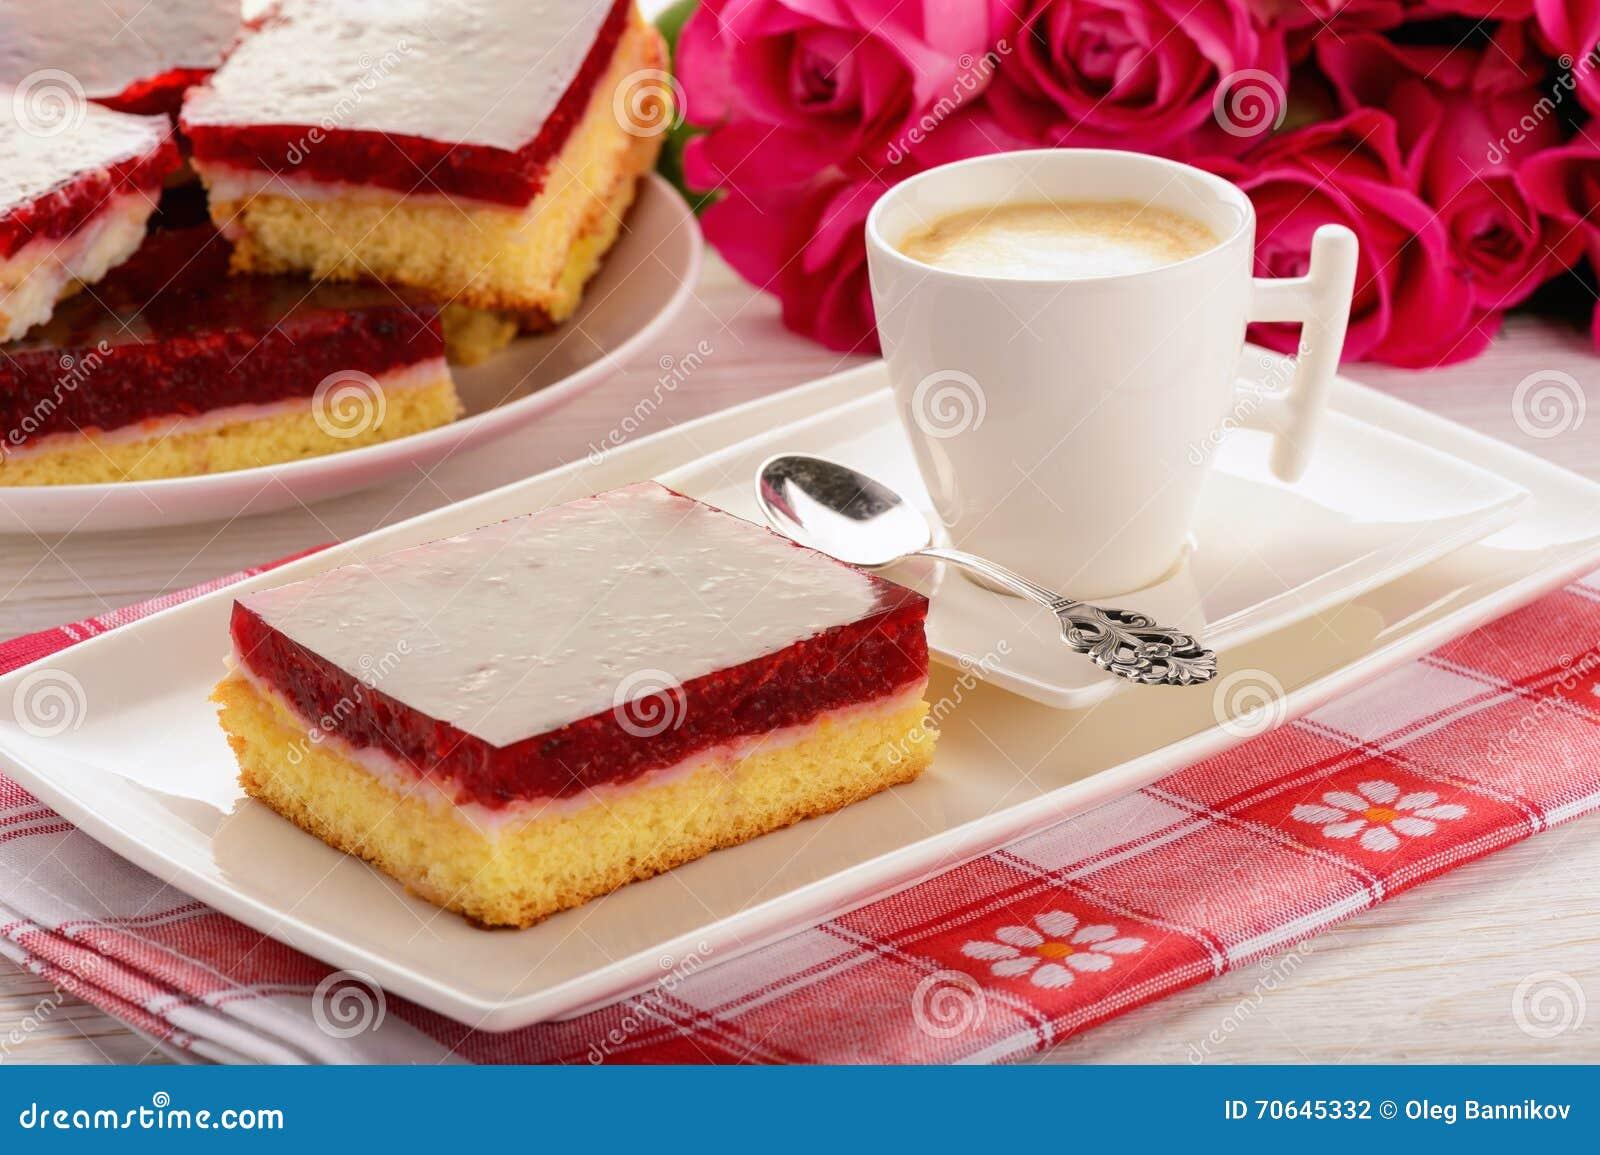 Cartoon Jelly Cake Recipe: Cake With Cherry Jelly And Coffee Royalty-Free Stock Photo